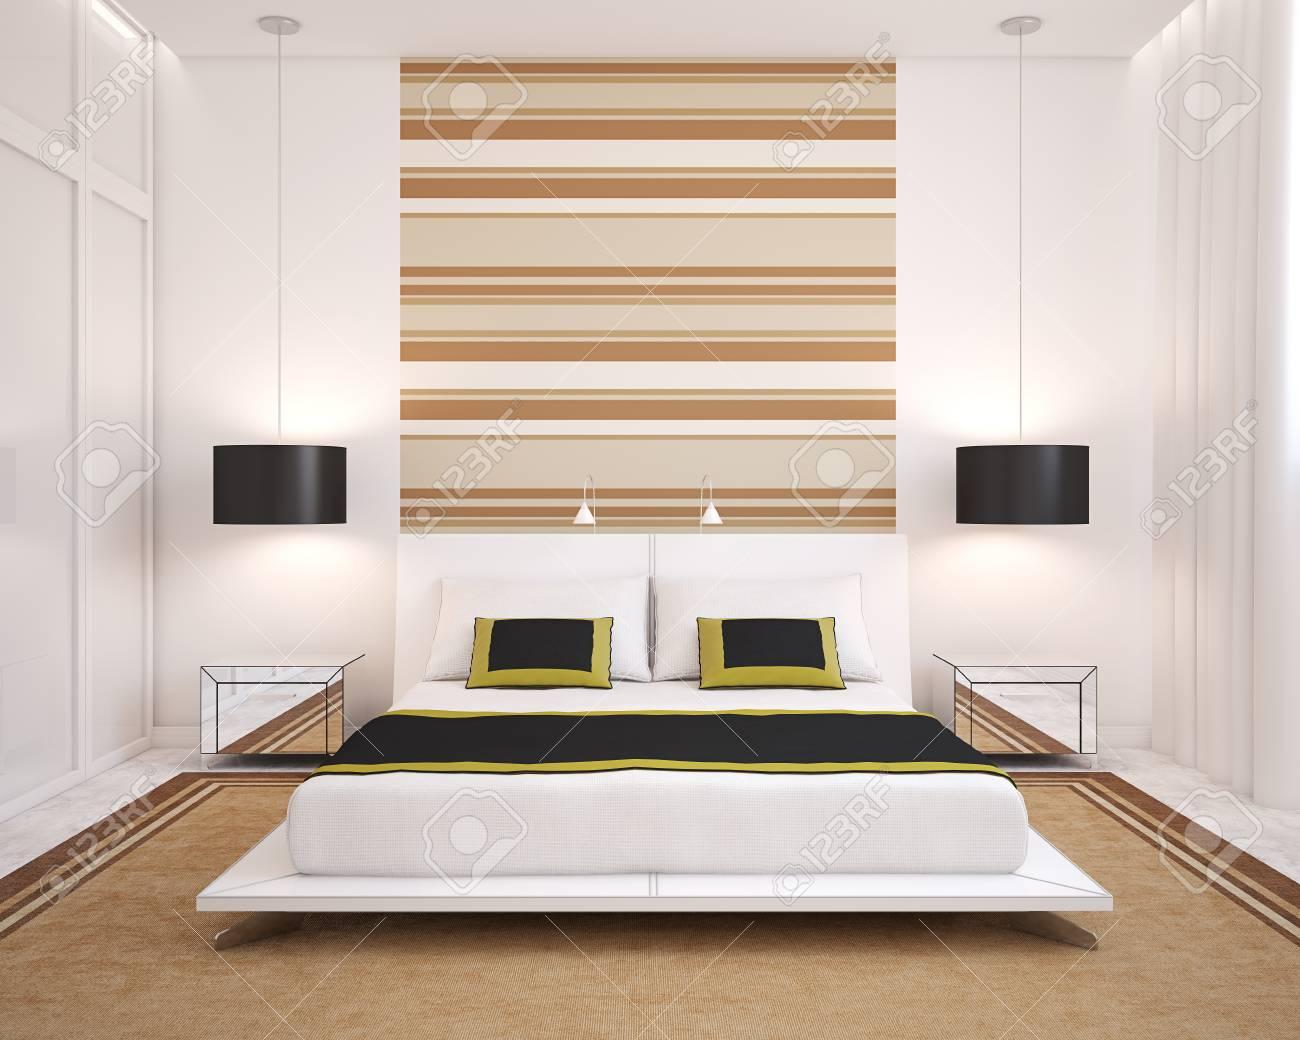 modern bedroom interior frontal view 3d render stock photo 45647684